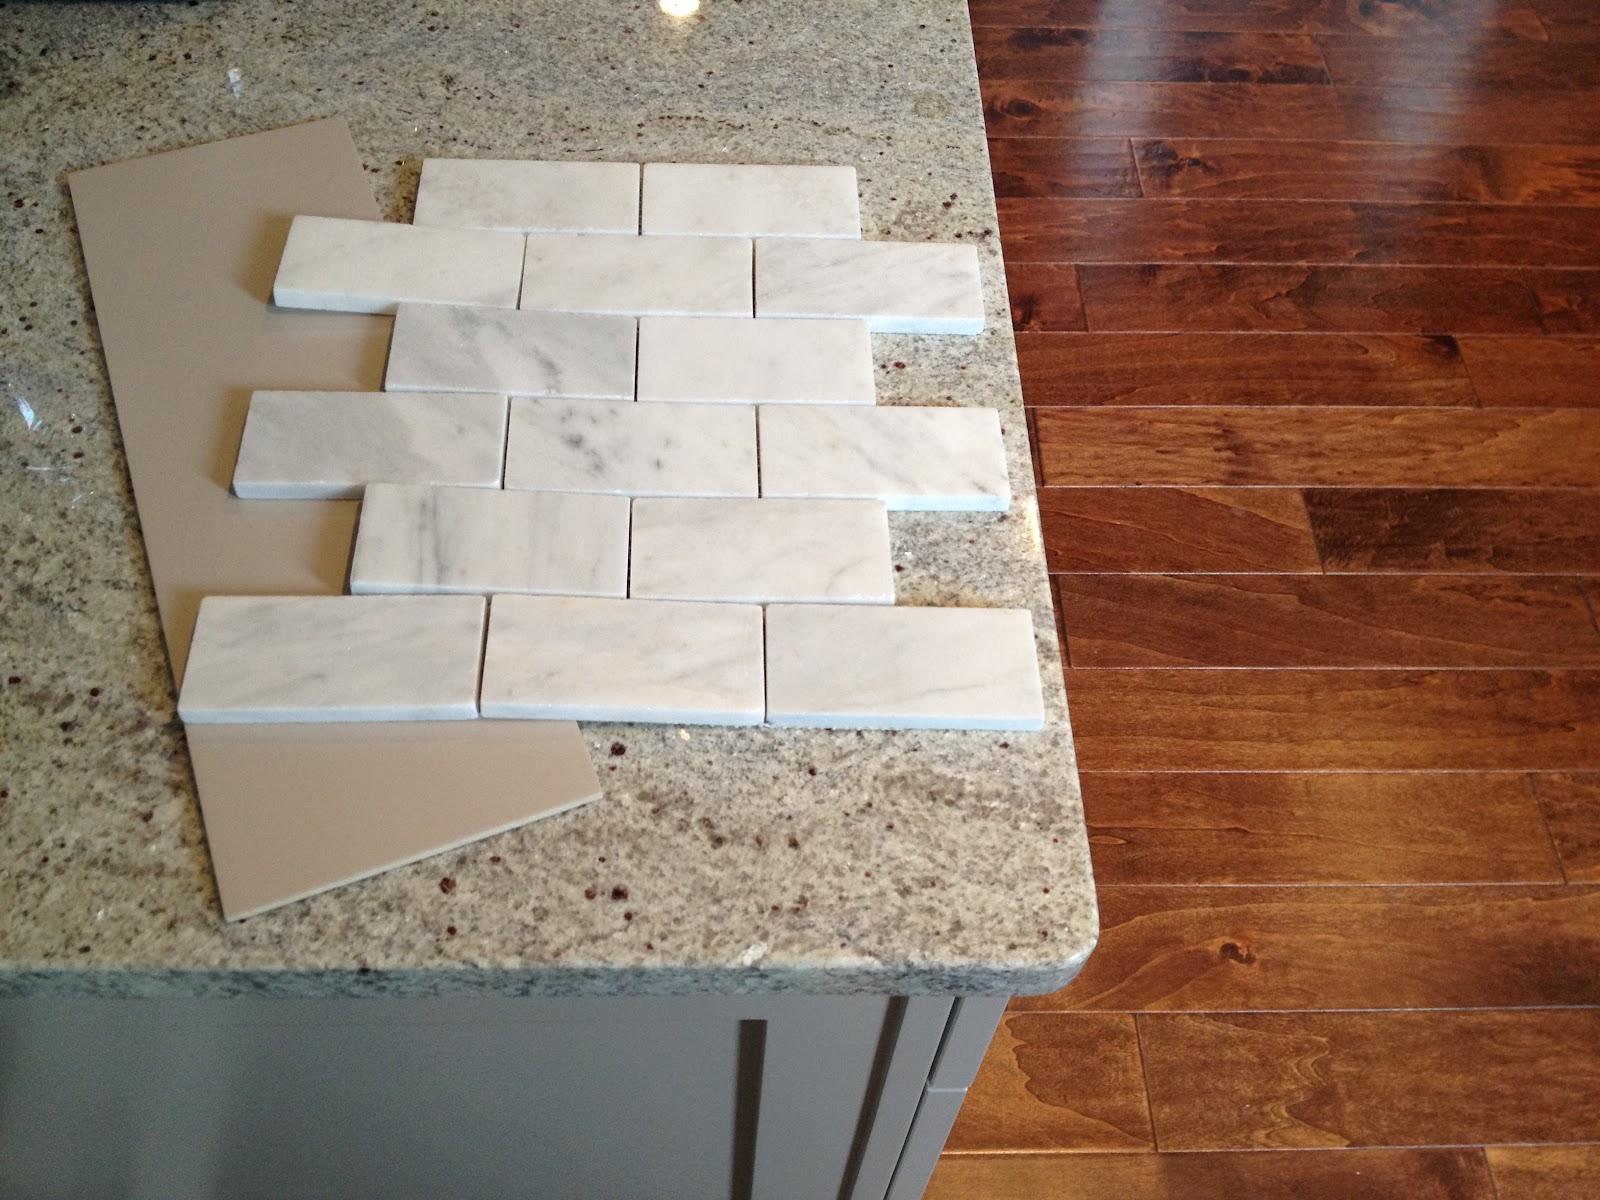 installing kitchen backsplash ideas installing kitchen backsplash Installing Kitchen Backsplash Ideas